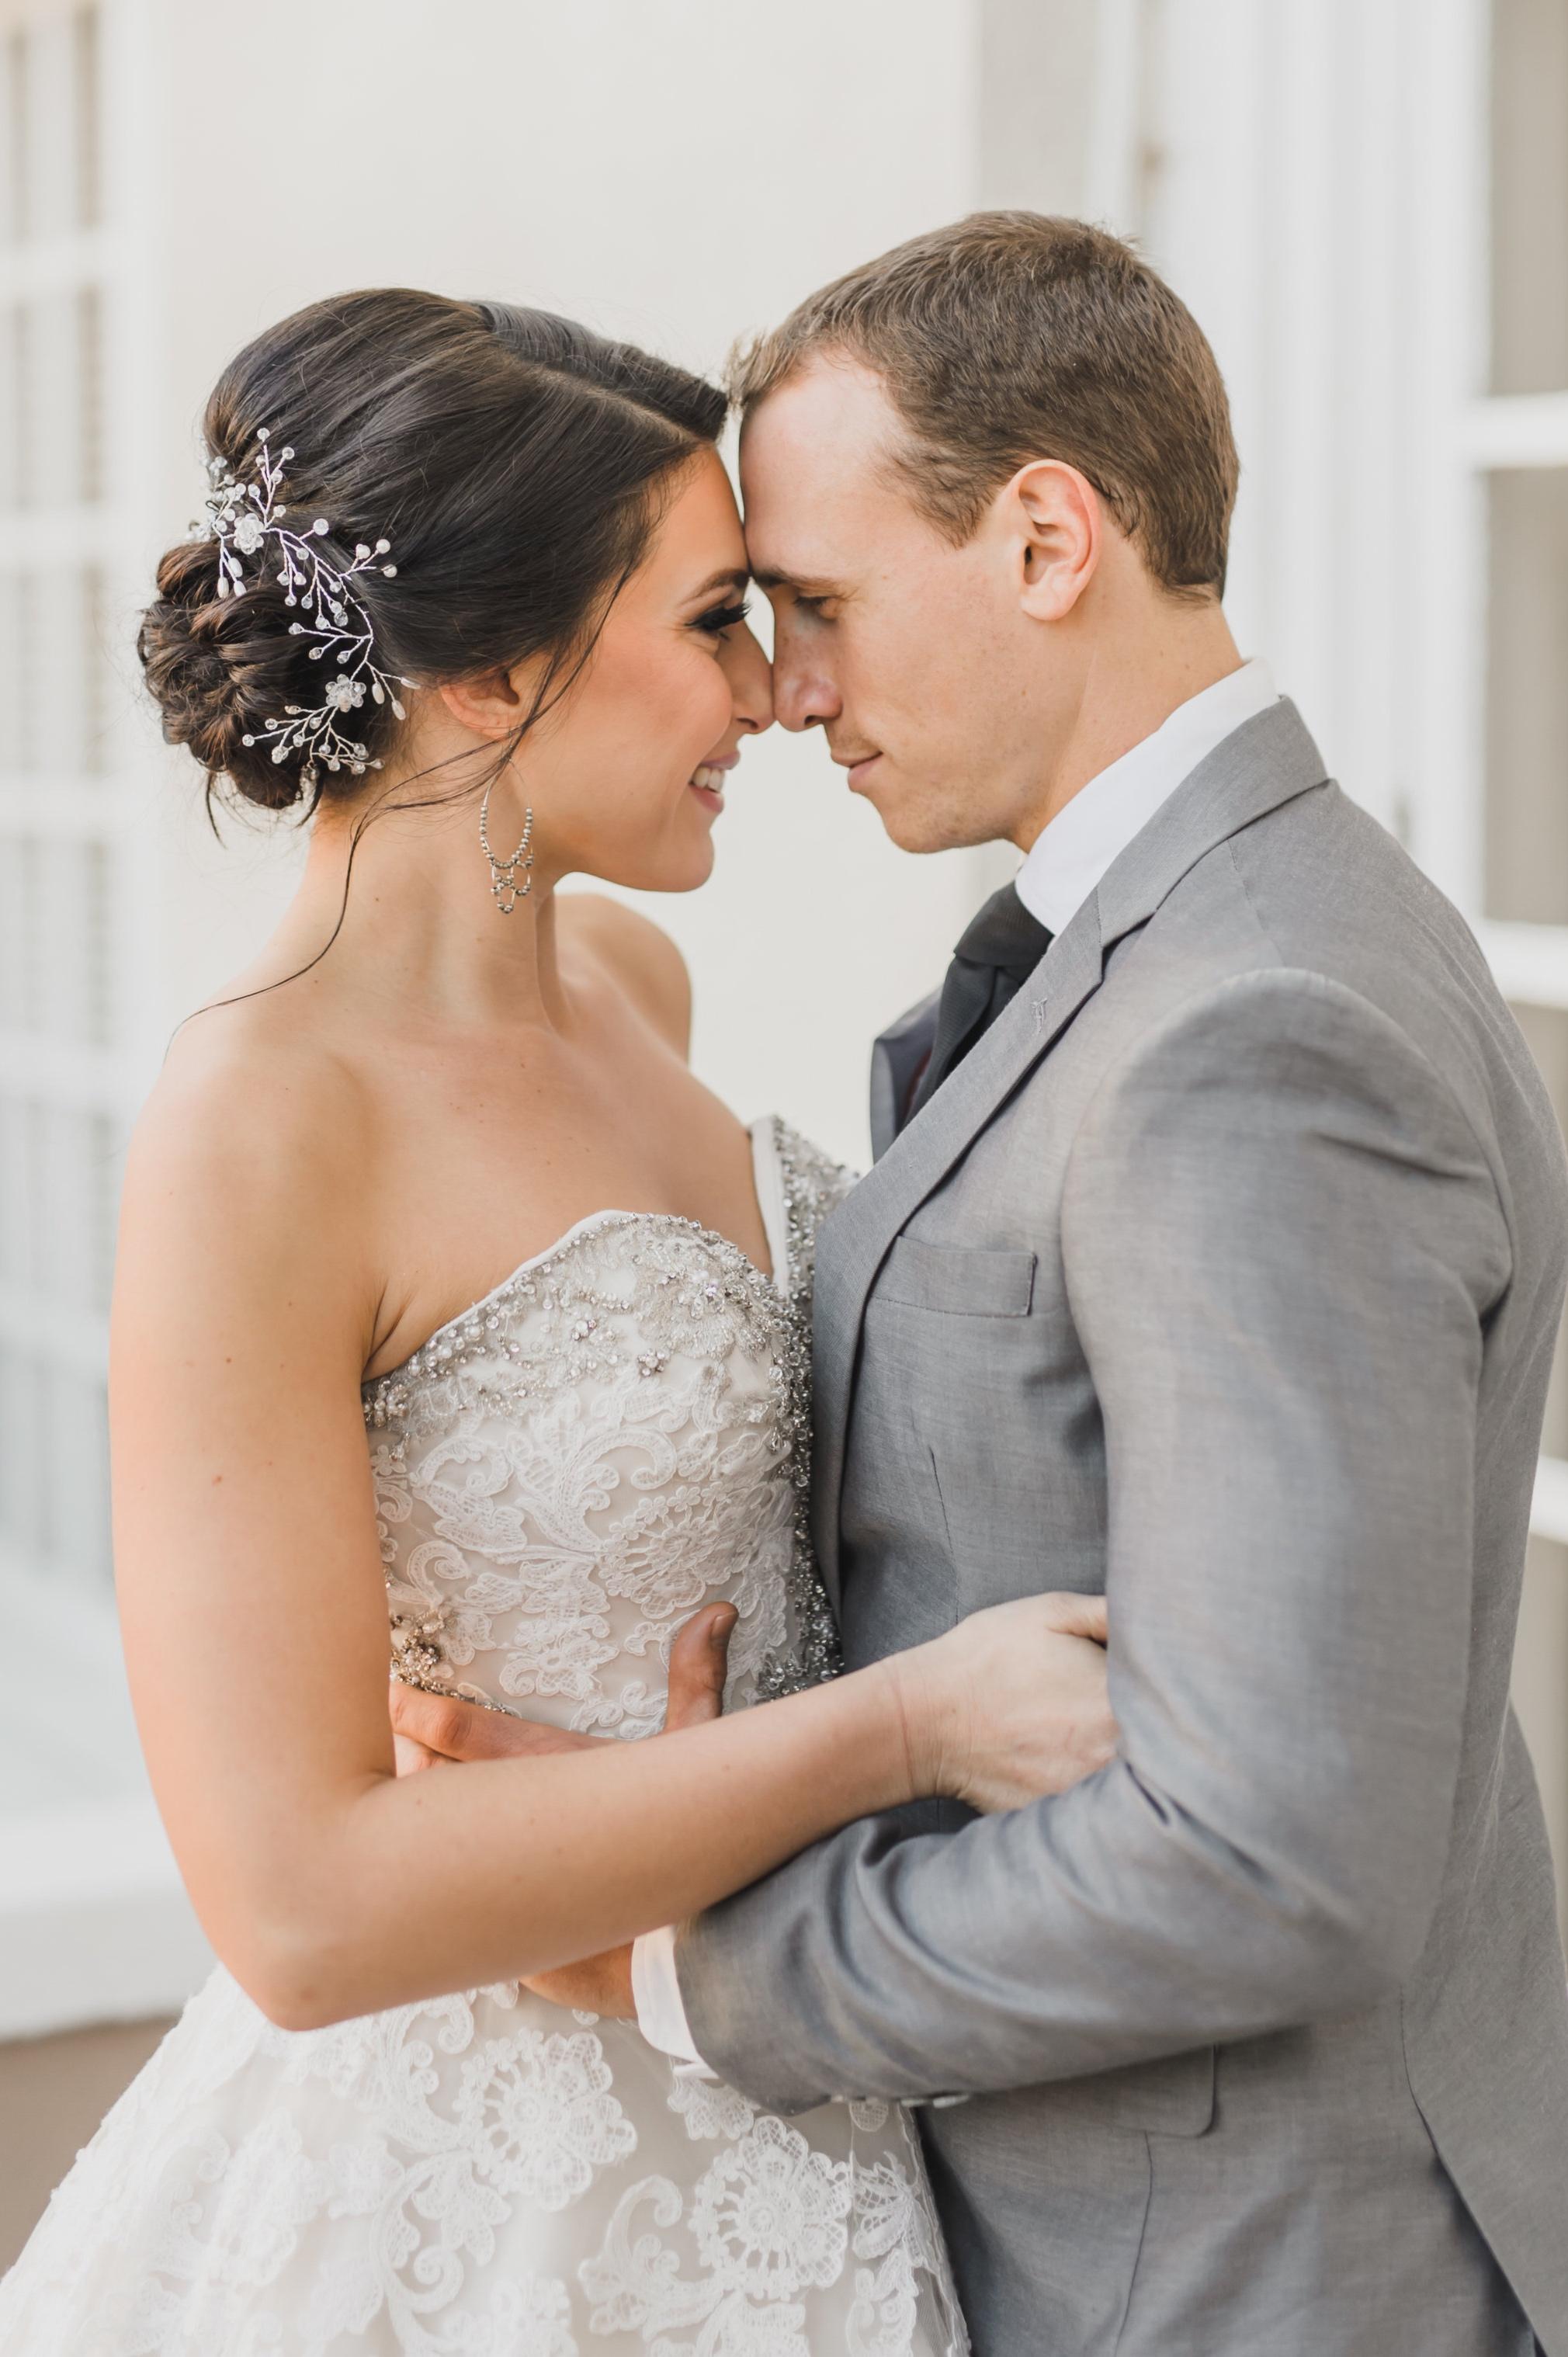 Destination_Wedding_Photographer_MHarrisStudios-8020.jpg